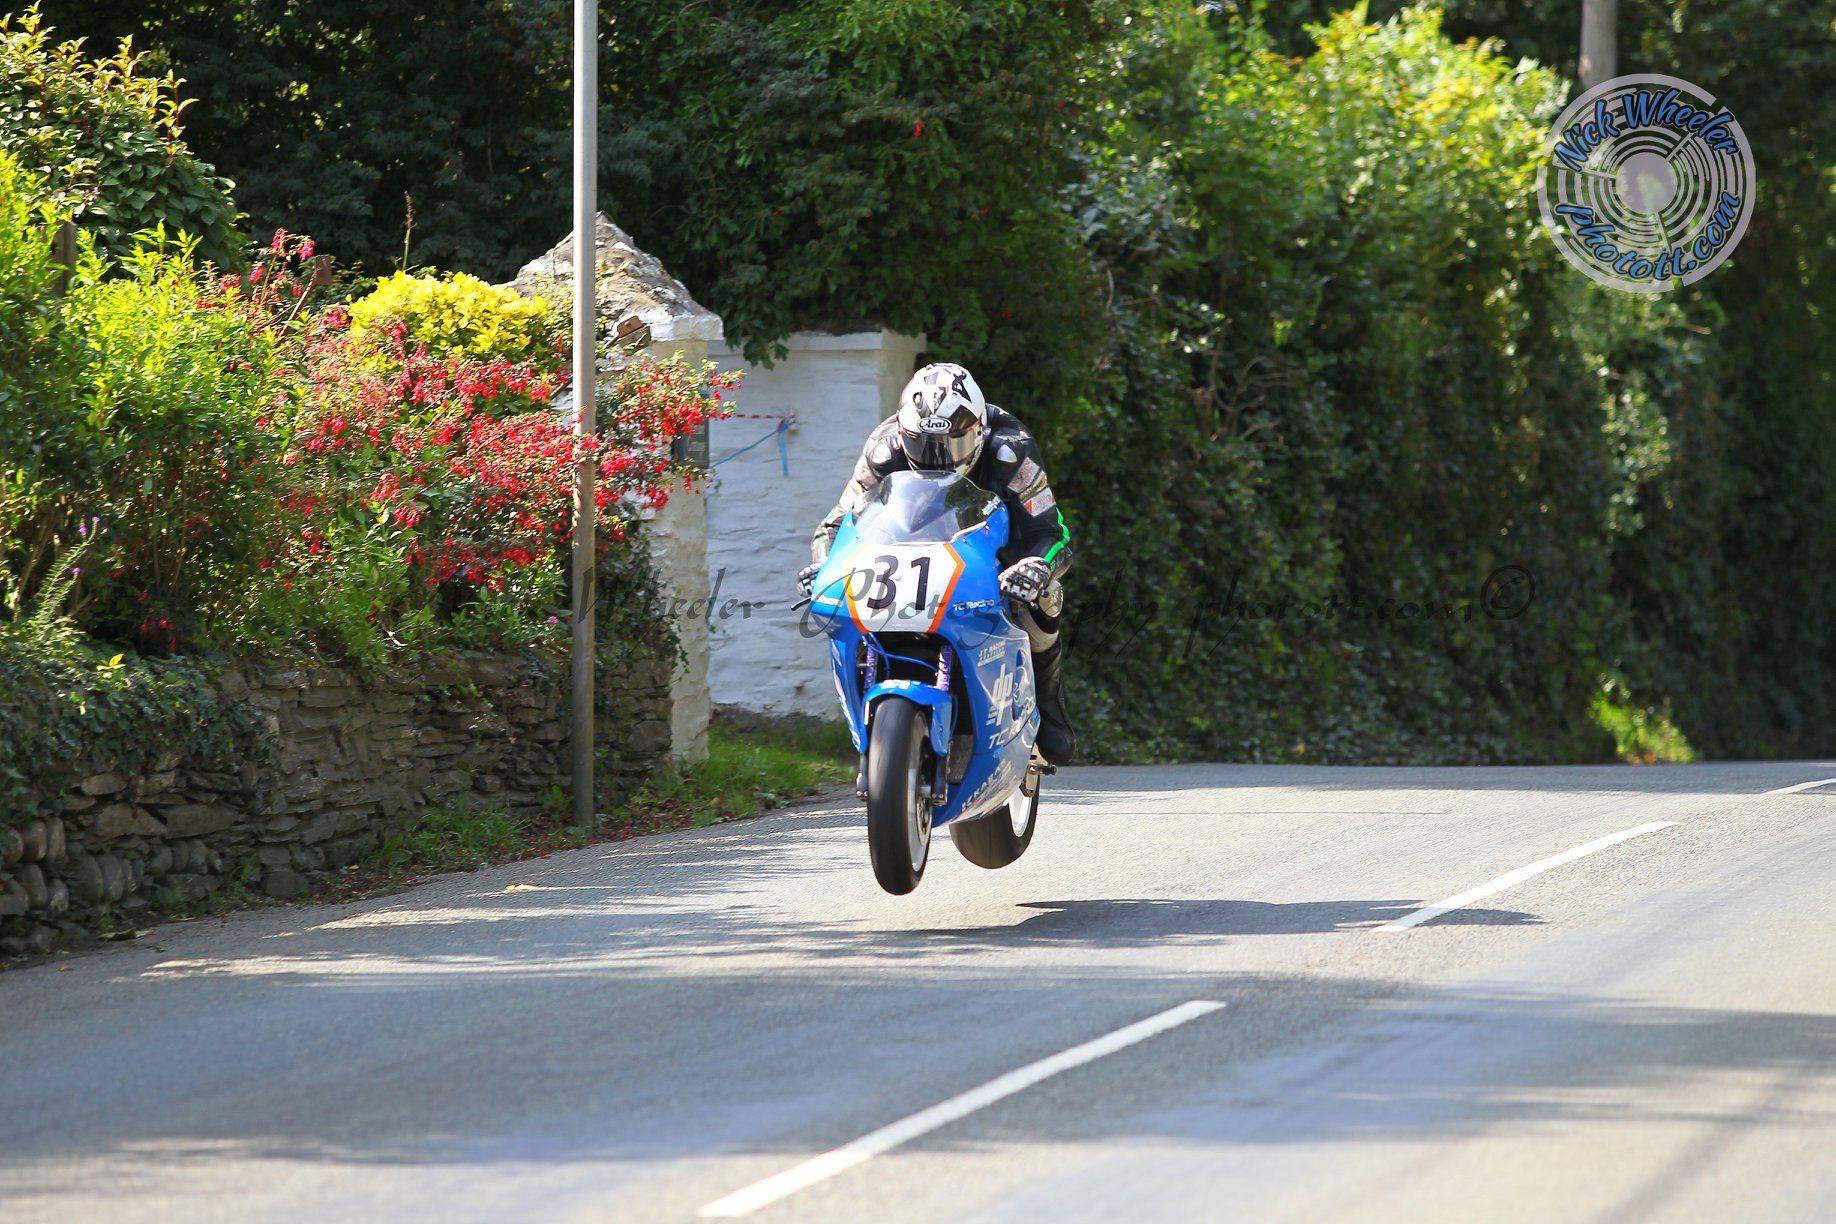 TC Racing Outline Classic TT, Manx GP Plans, Confirm Respective Event Tenures With Trummer, Witt